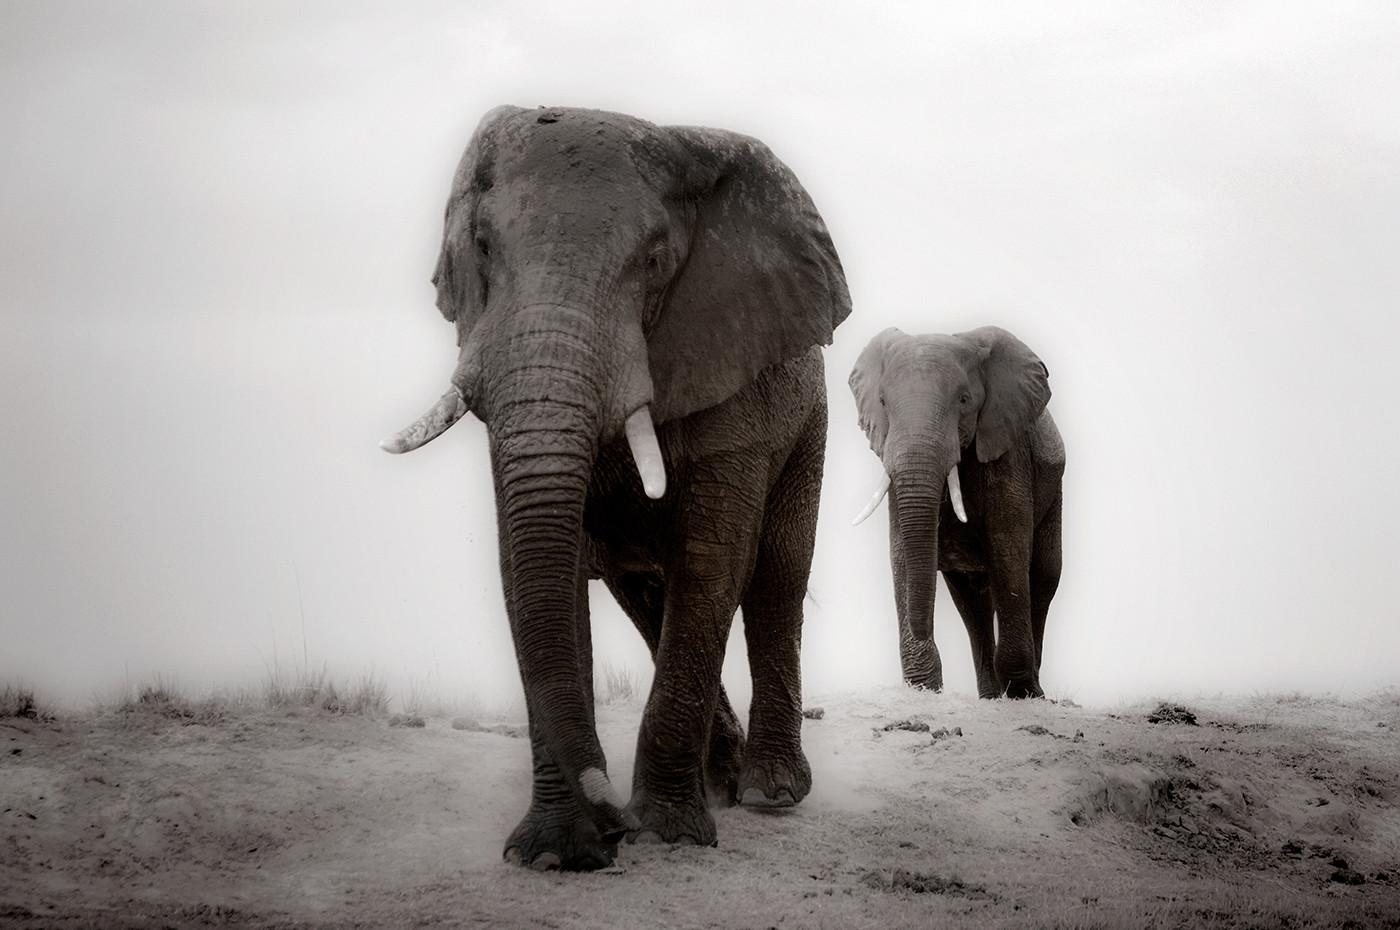 16 TREKKING TOWARDS BOTSWANA by Peter Tulloch